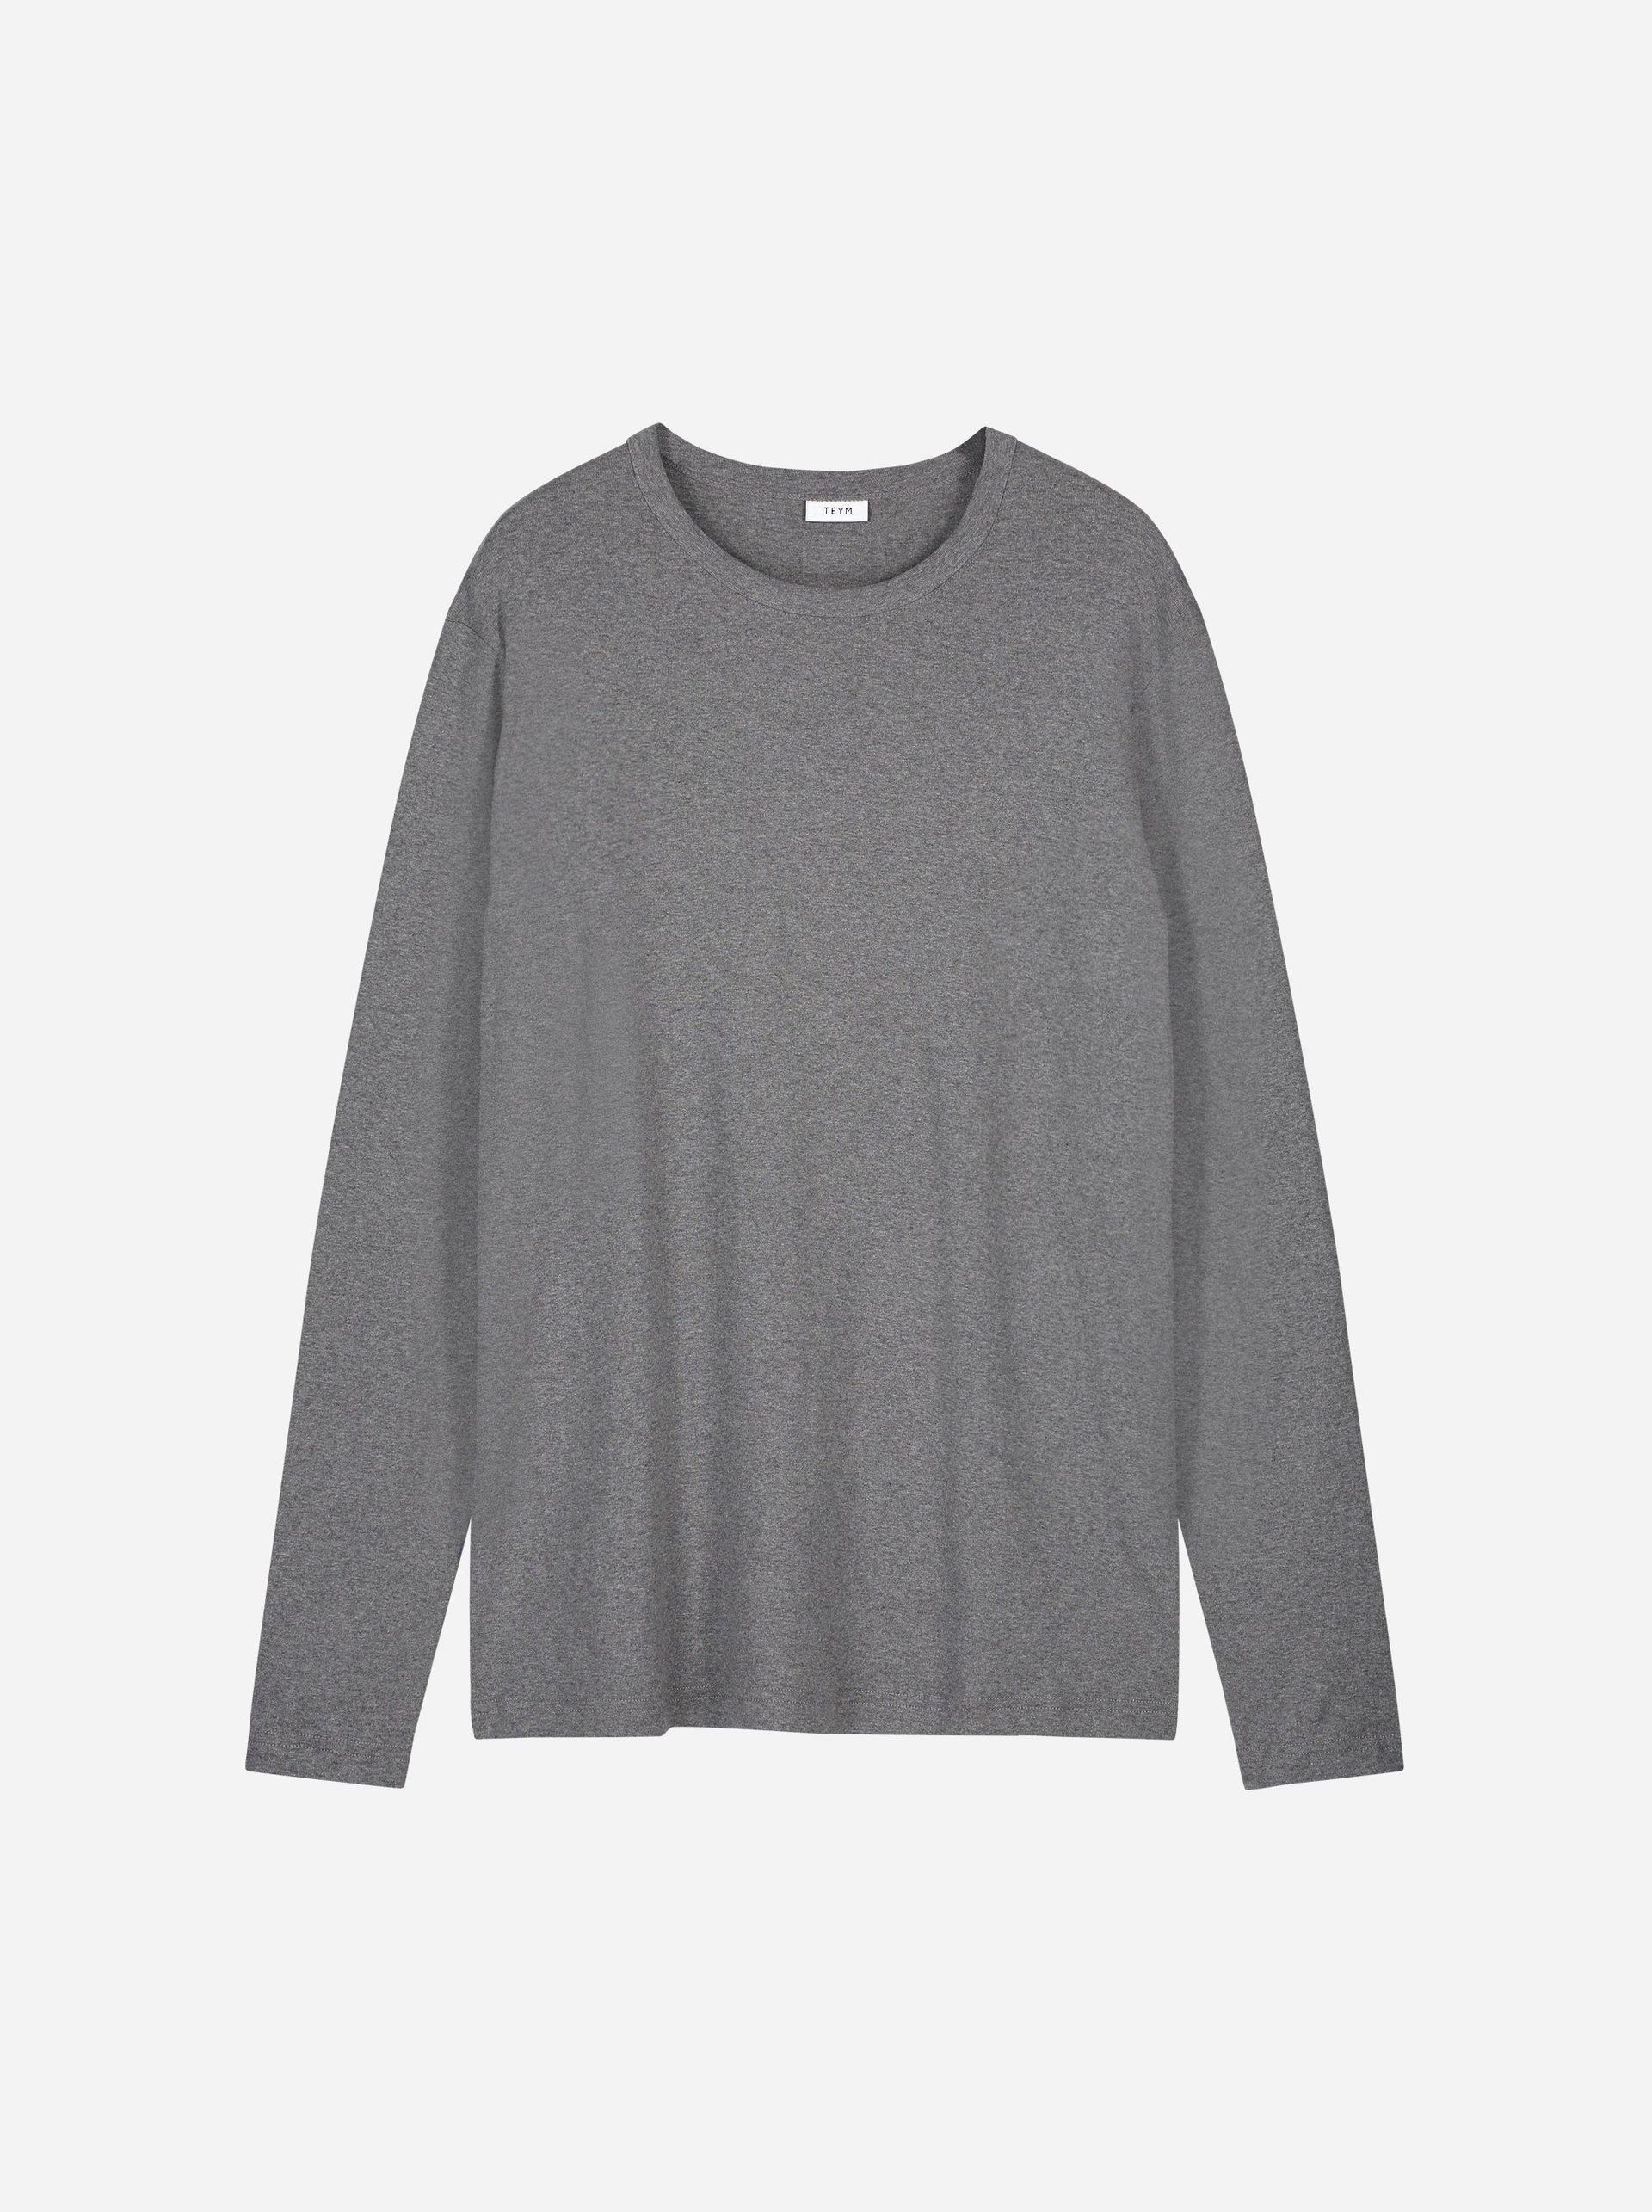 Teym - The-T-Shirt - Longsleeve - Men - Melange Grey - 4B